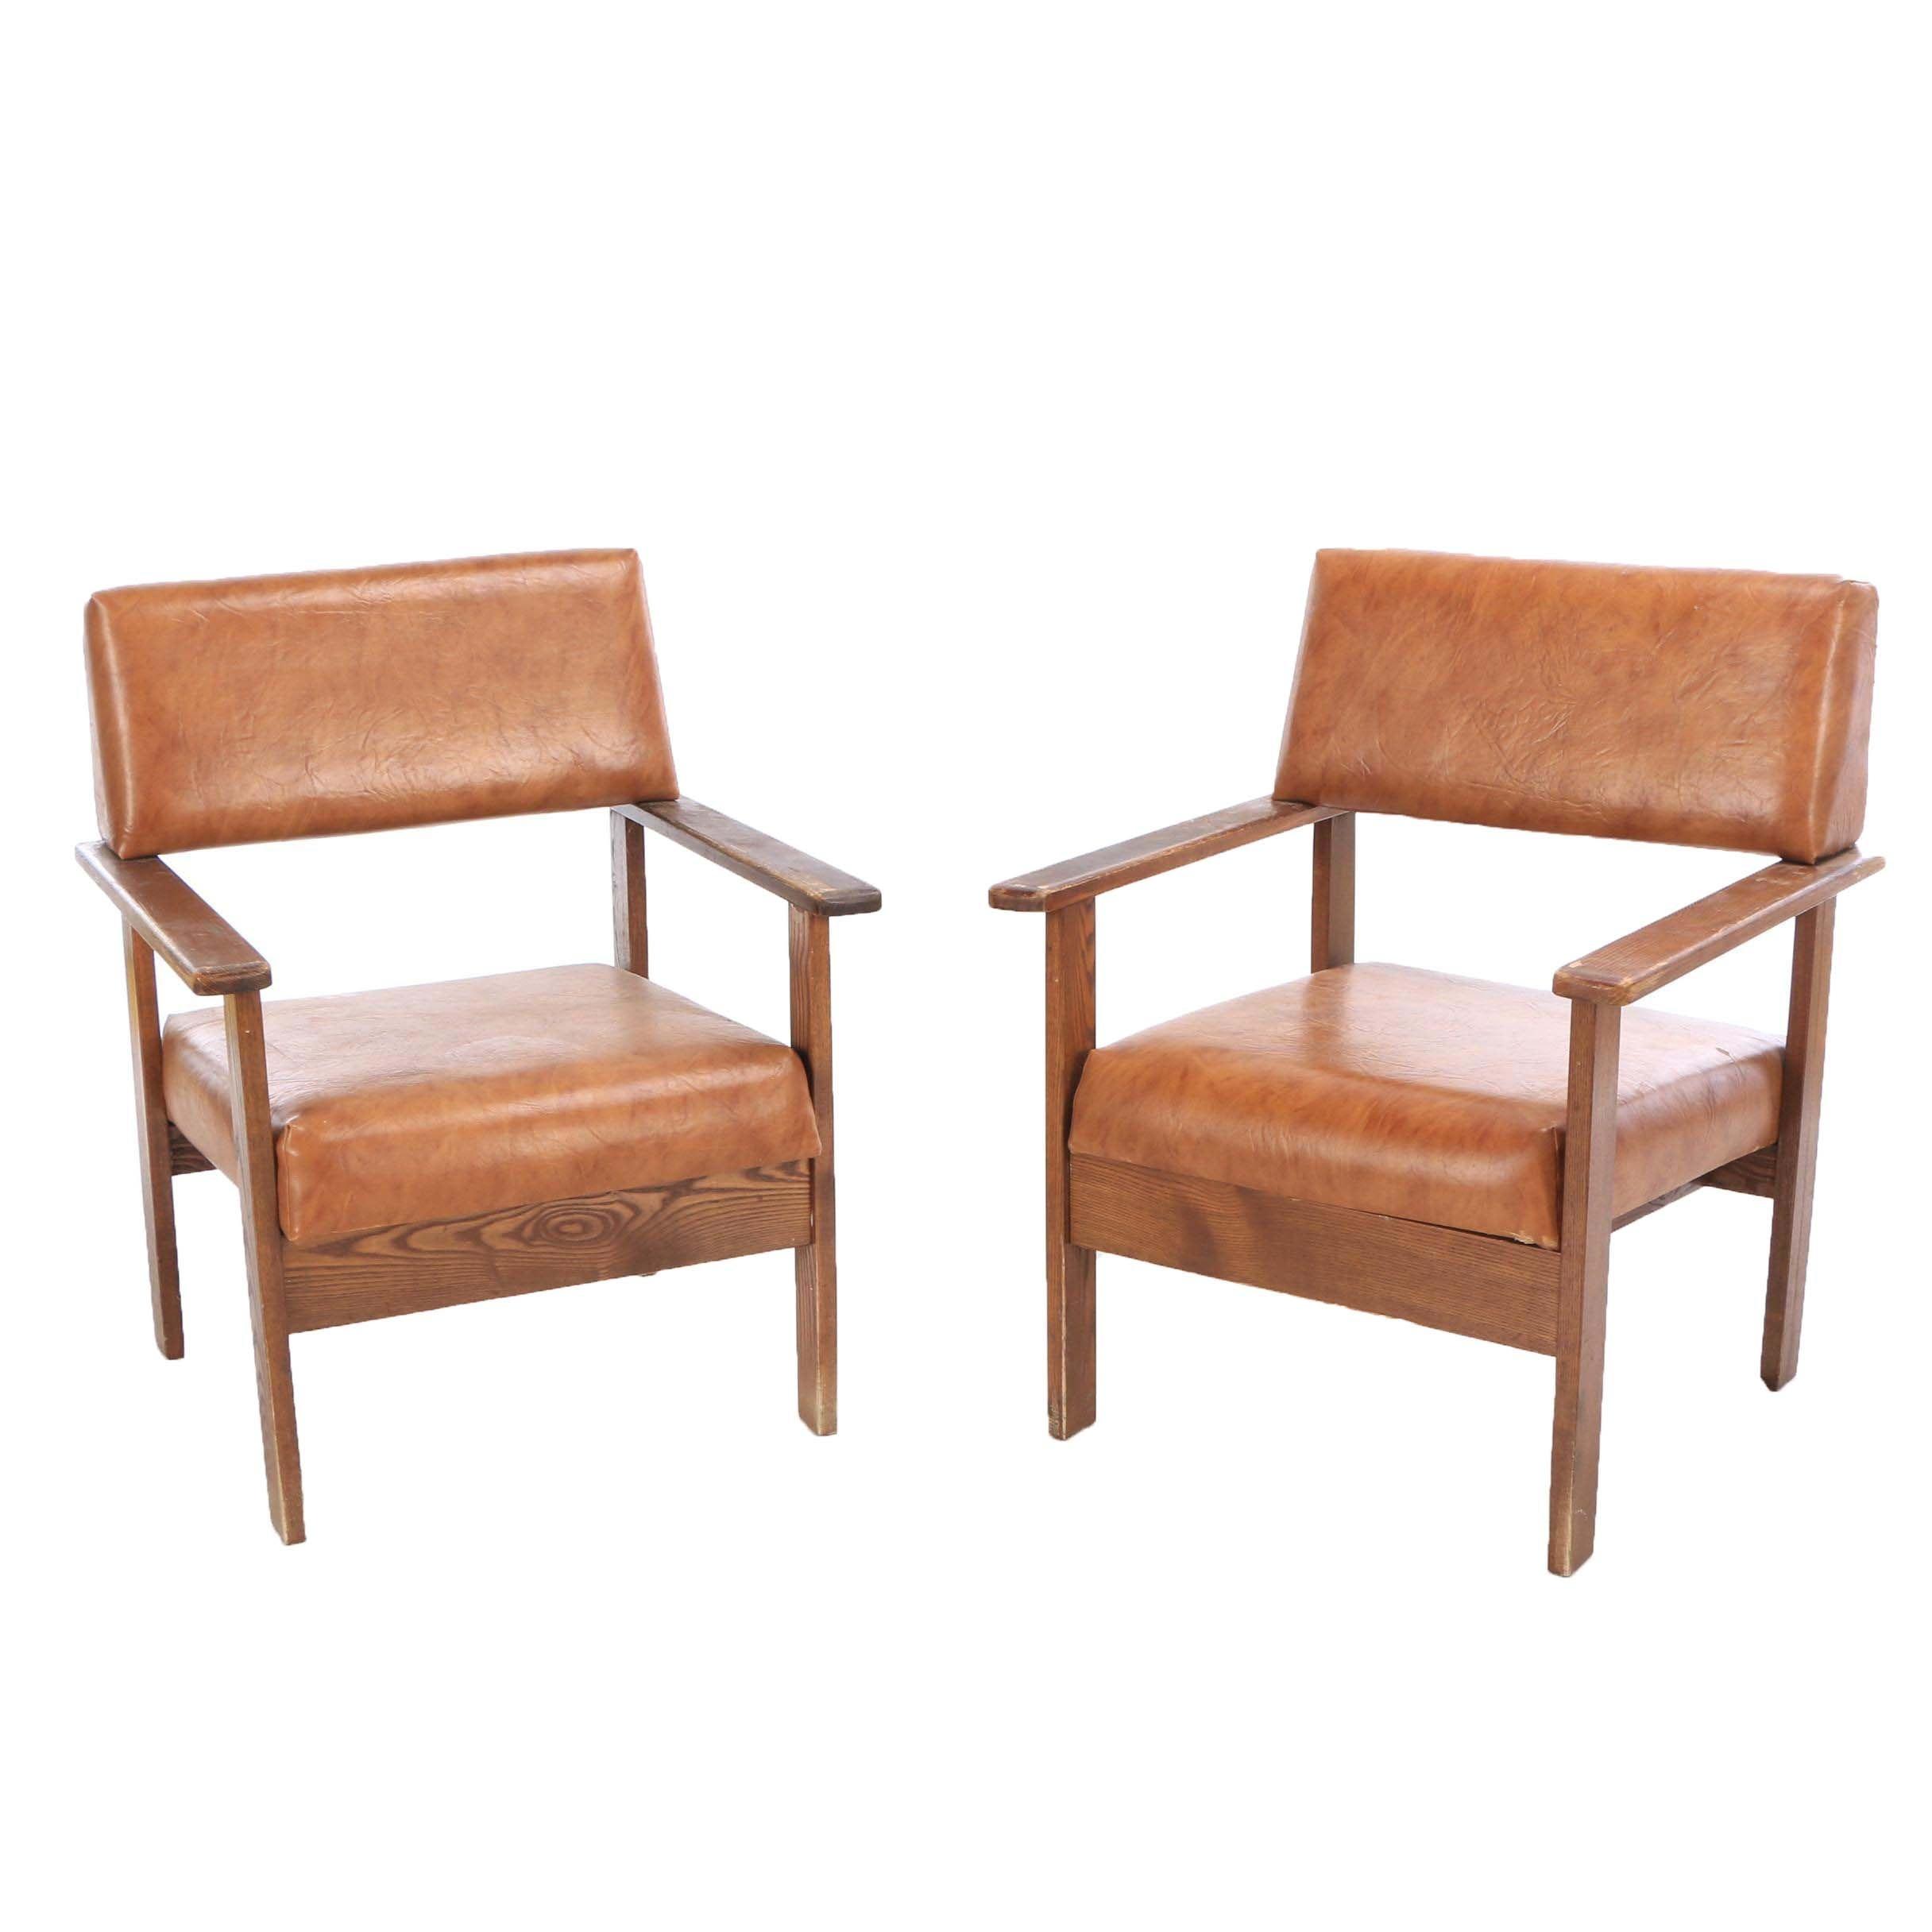 Oak Frame Vinyl Upholstered Office Chairs, Mid-20th Century